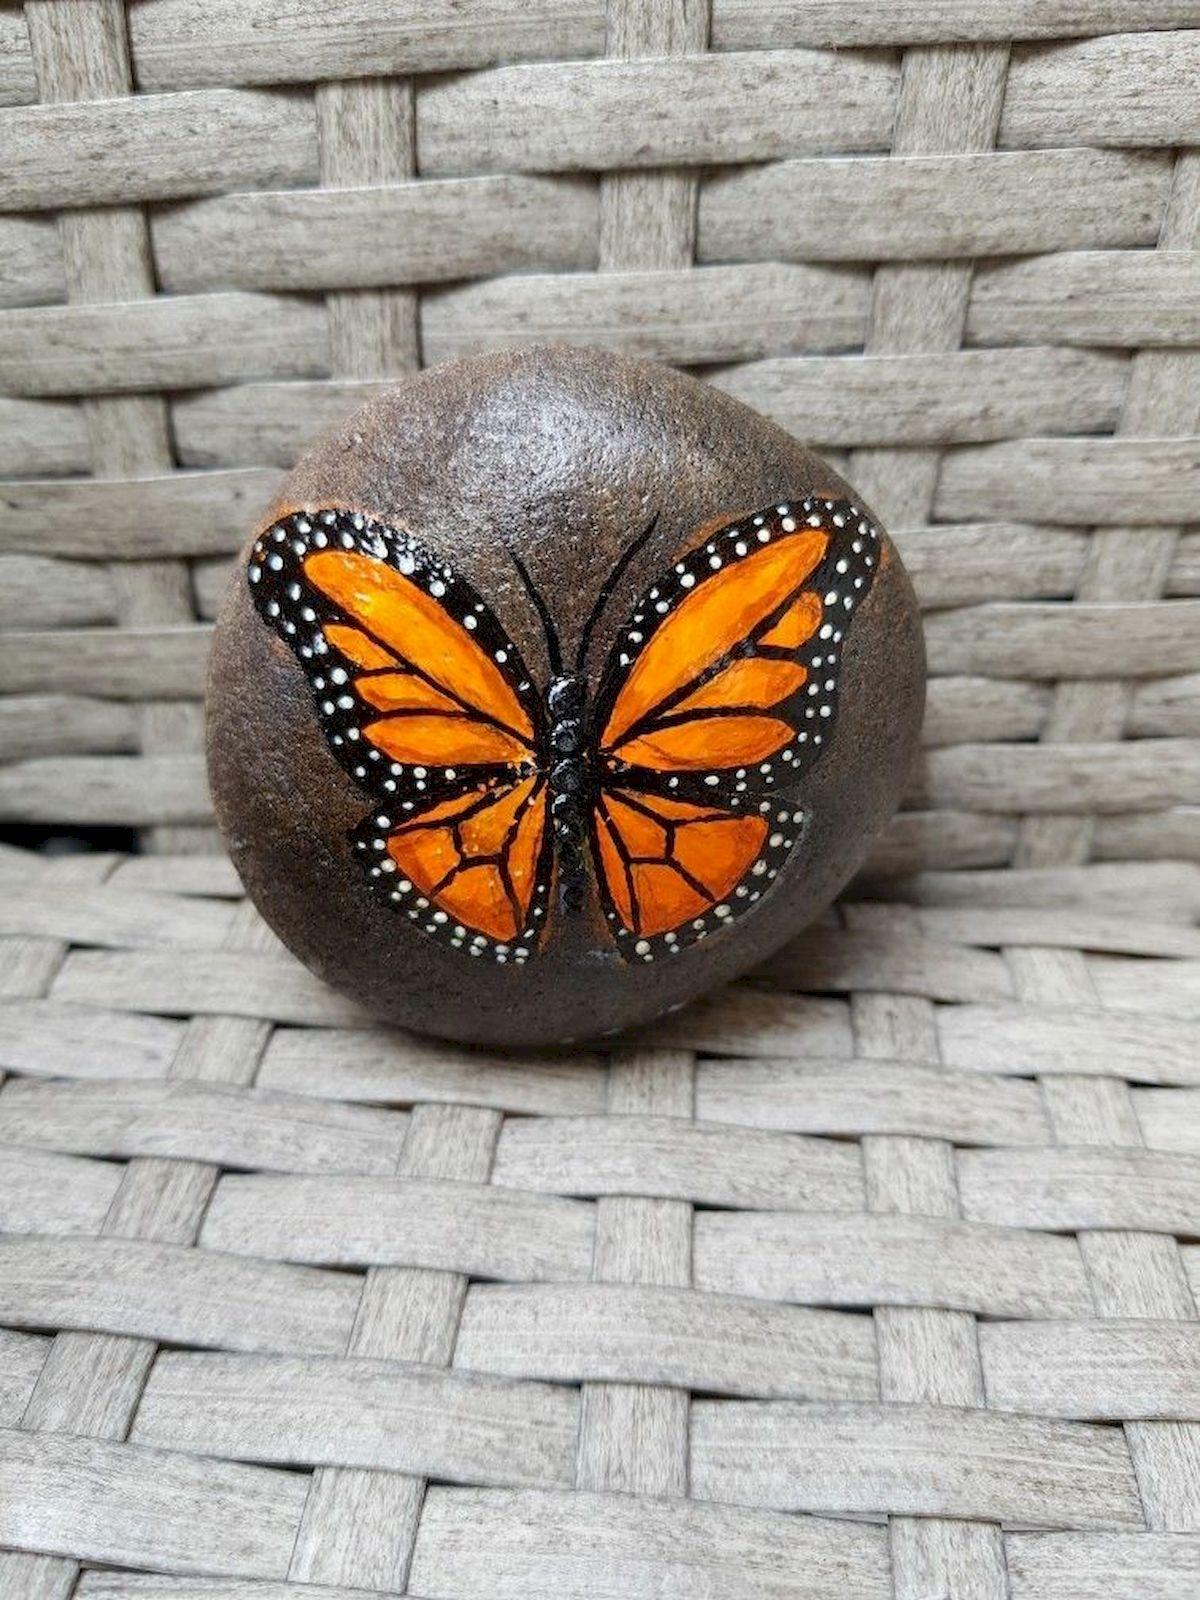 55 Cute DIY Painted Rocks Animals Butterfly Ideas (7)